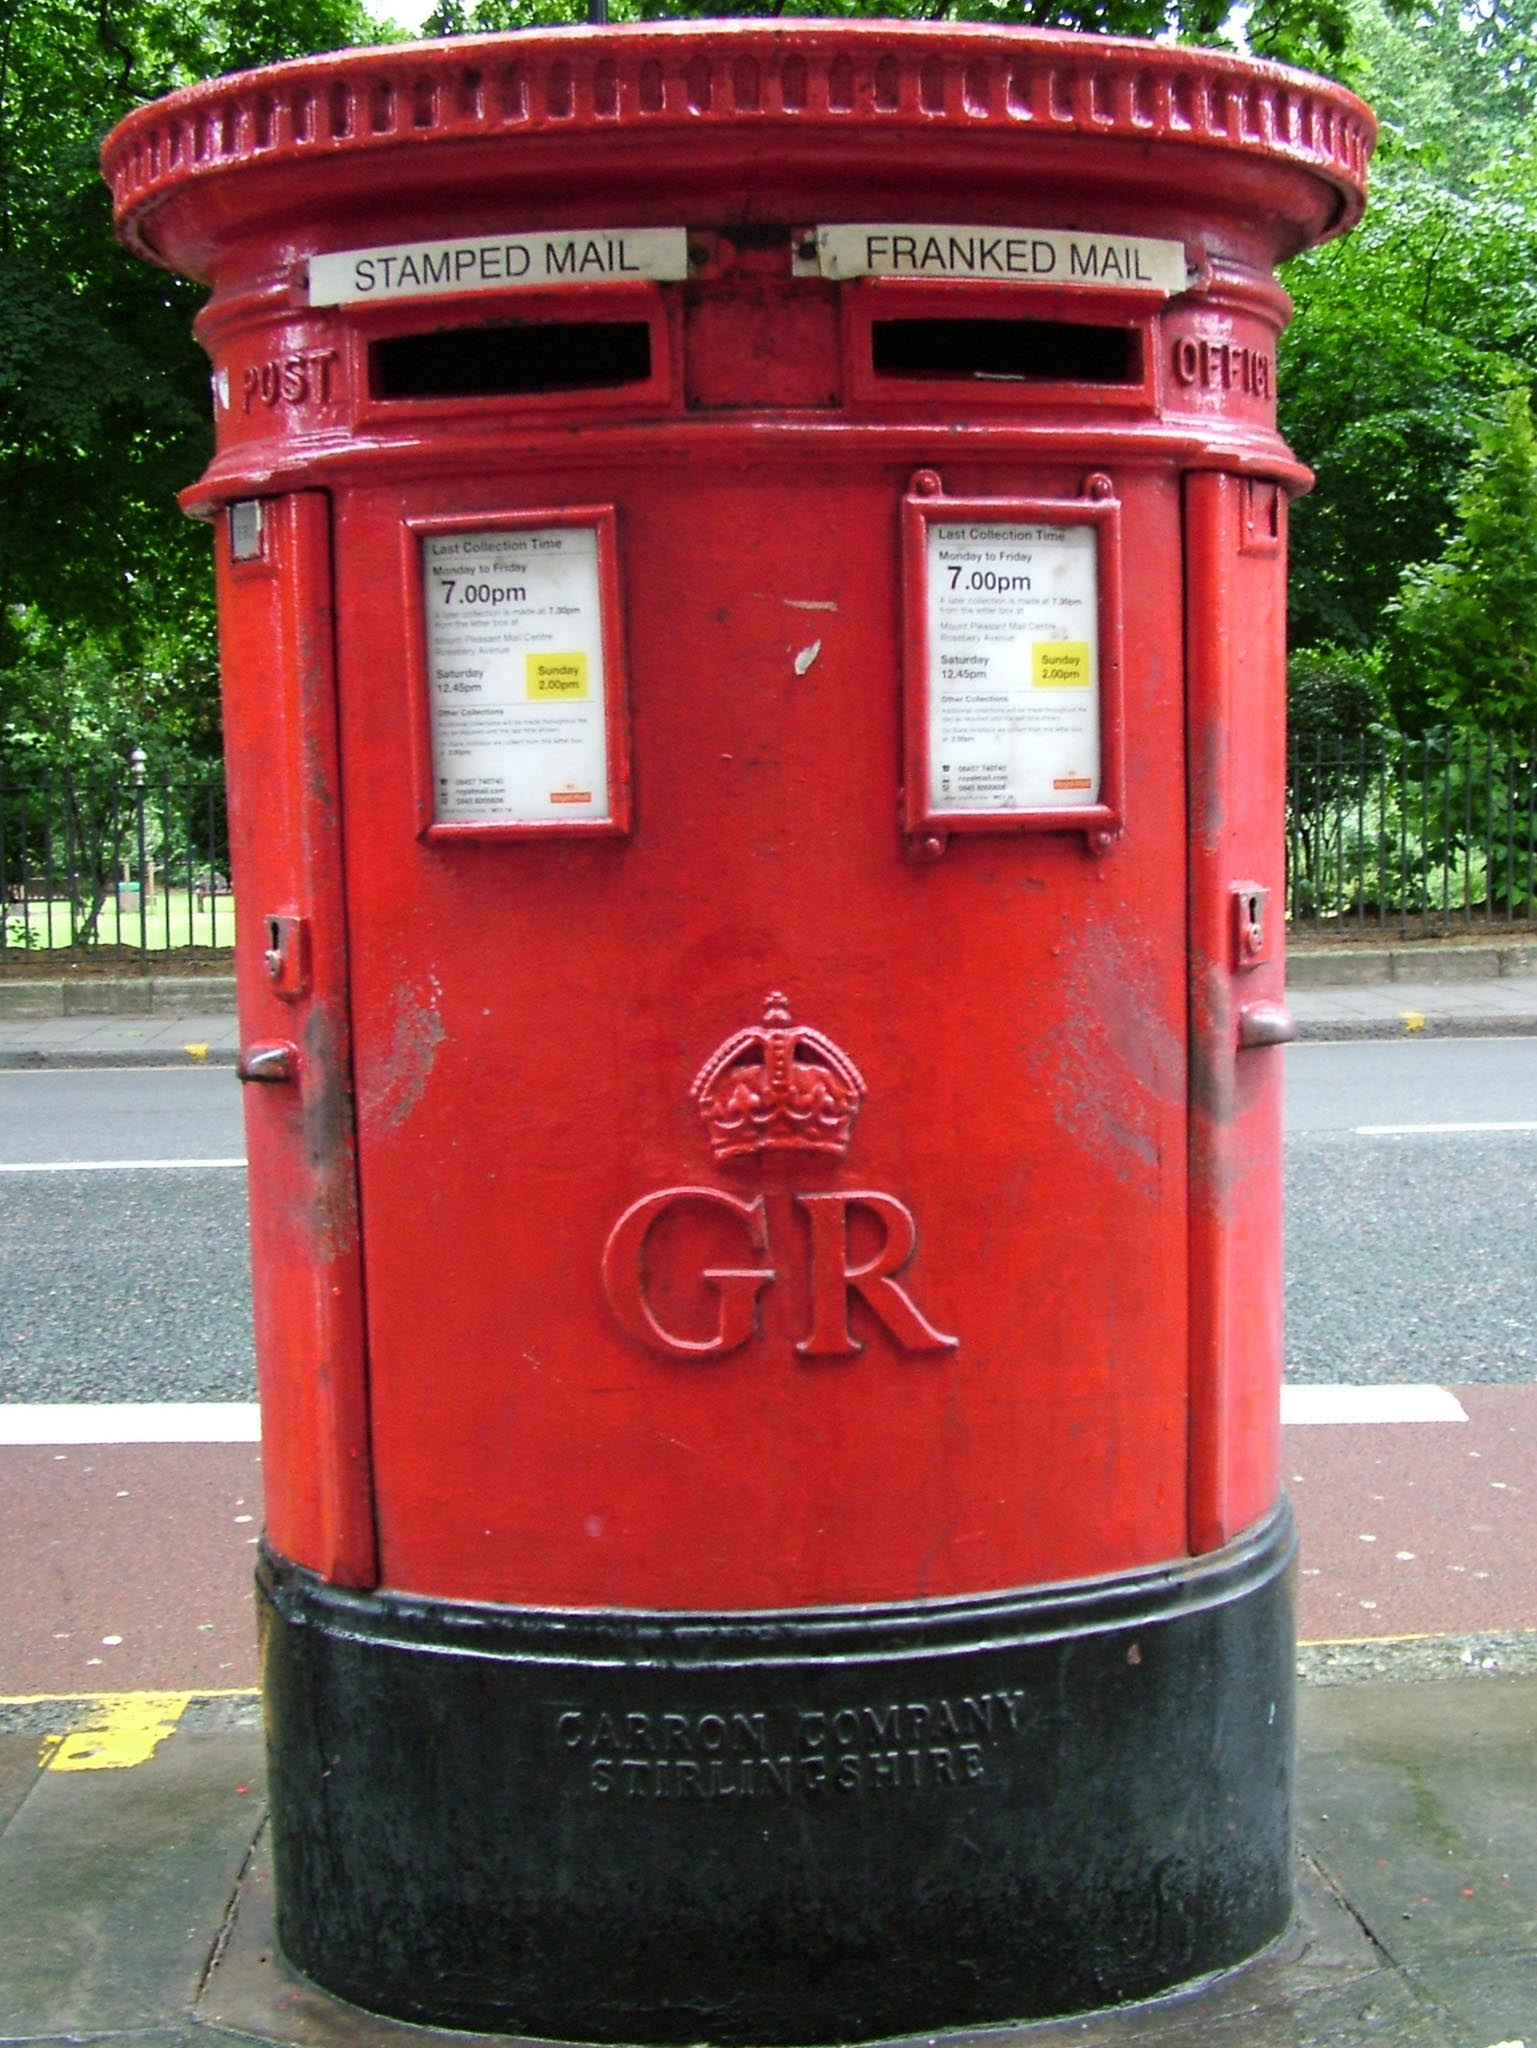 GR pillar box 1930s, London. Gerry Cork